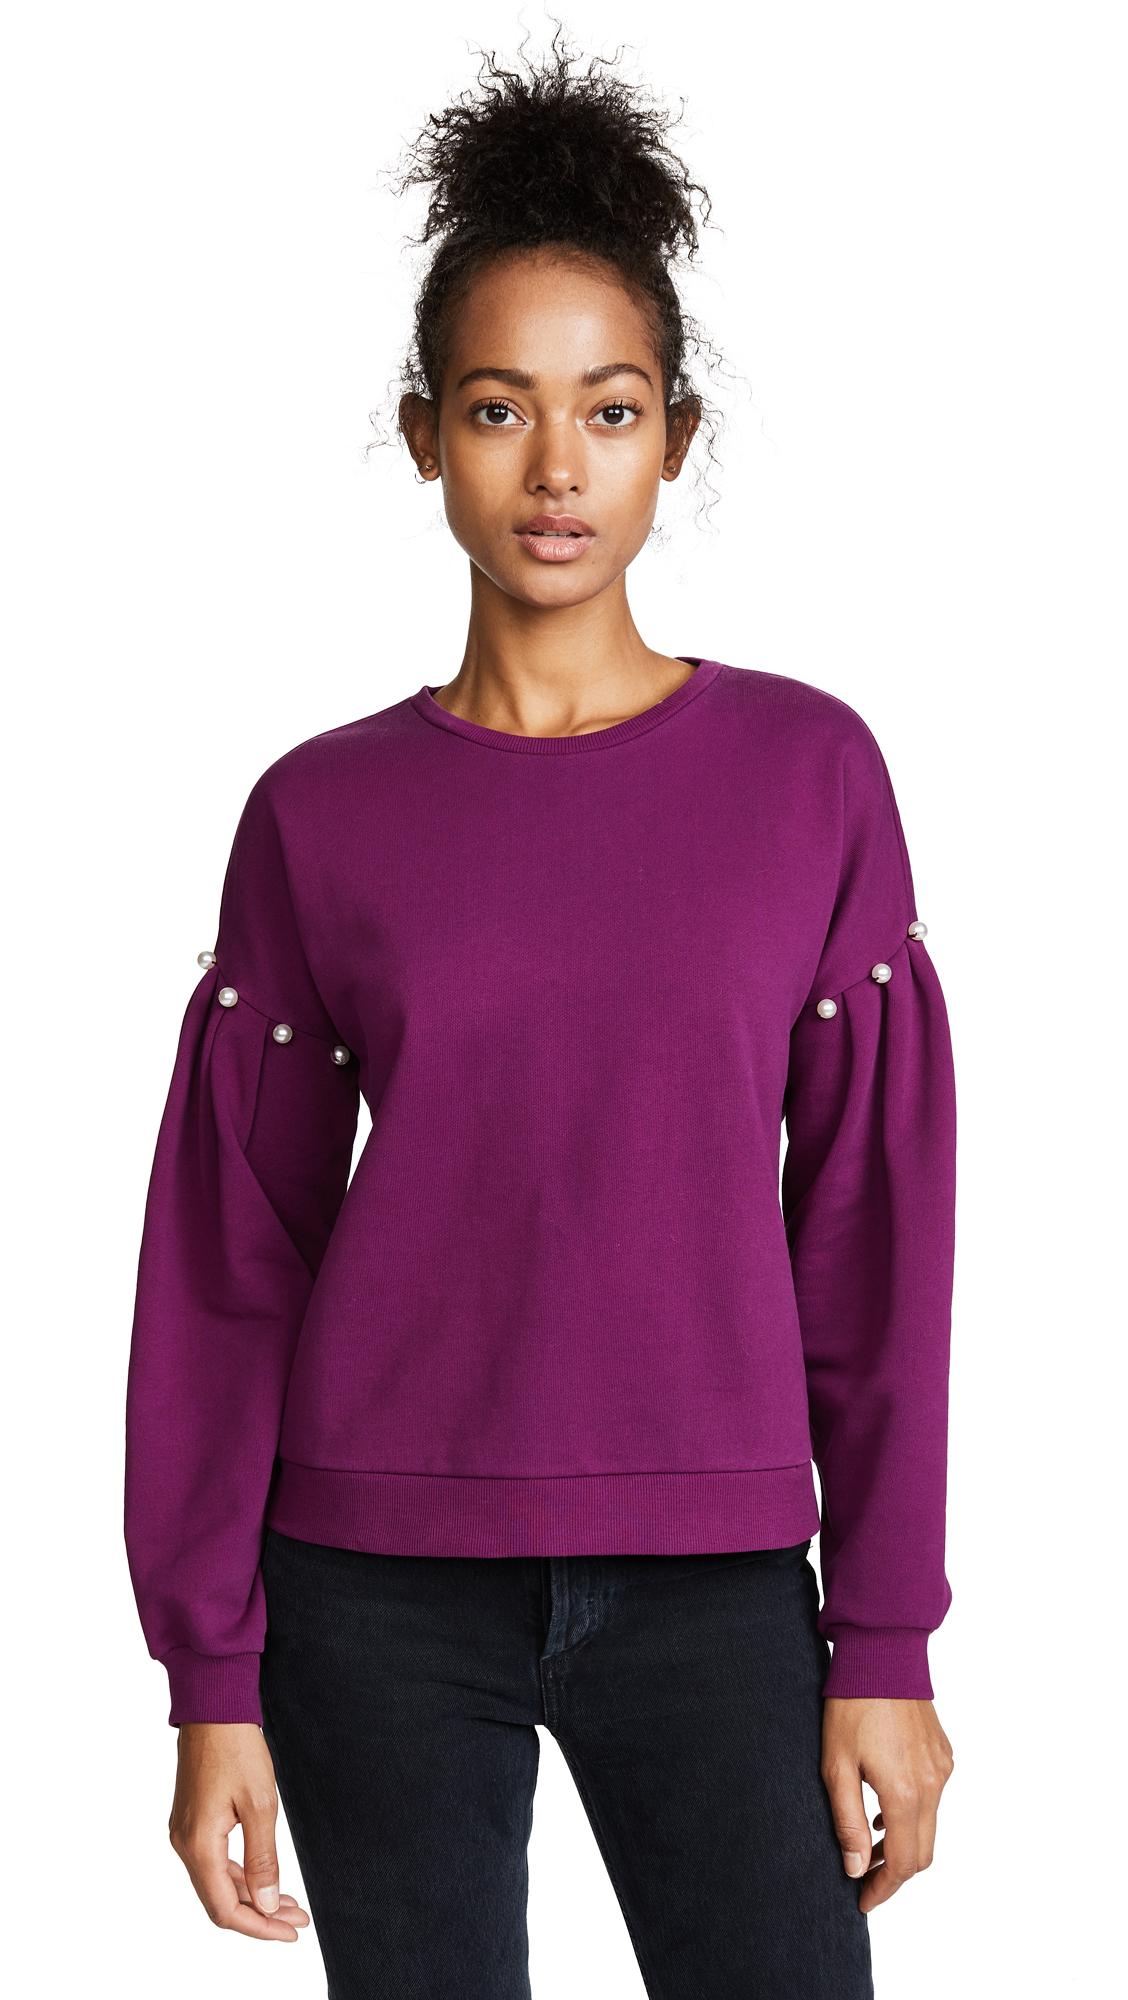 Rebecca Minkoff Ellison Sweatshirt - Plum